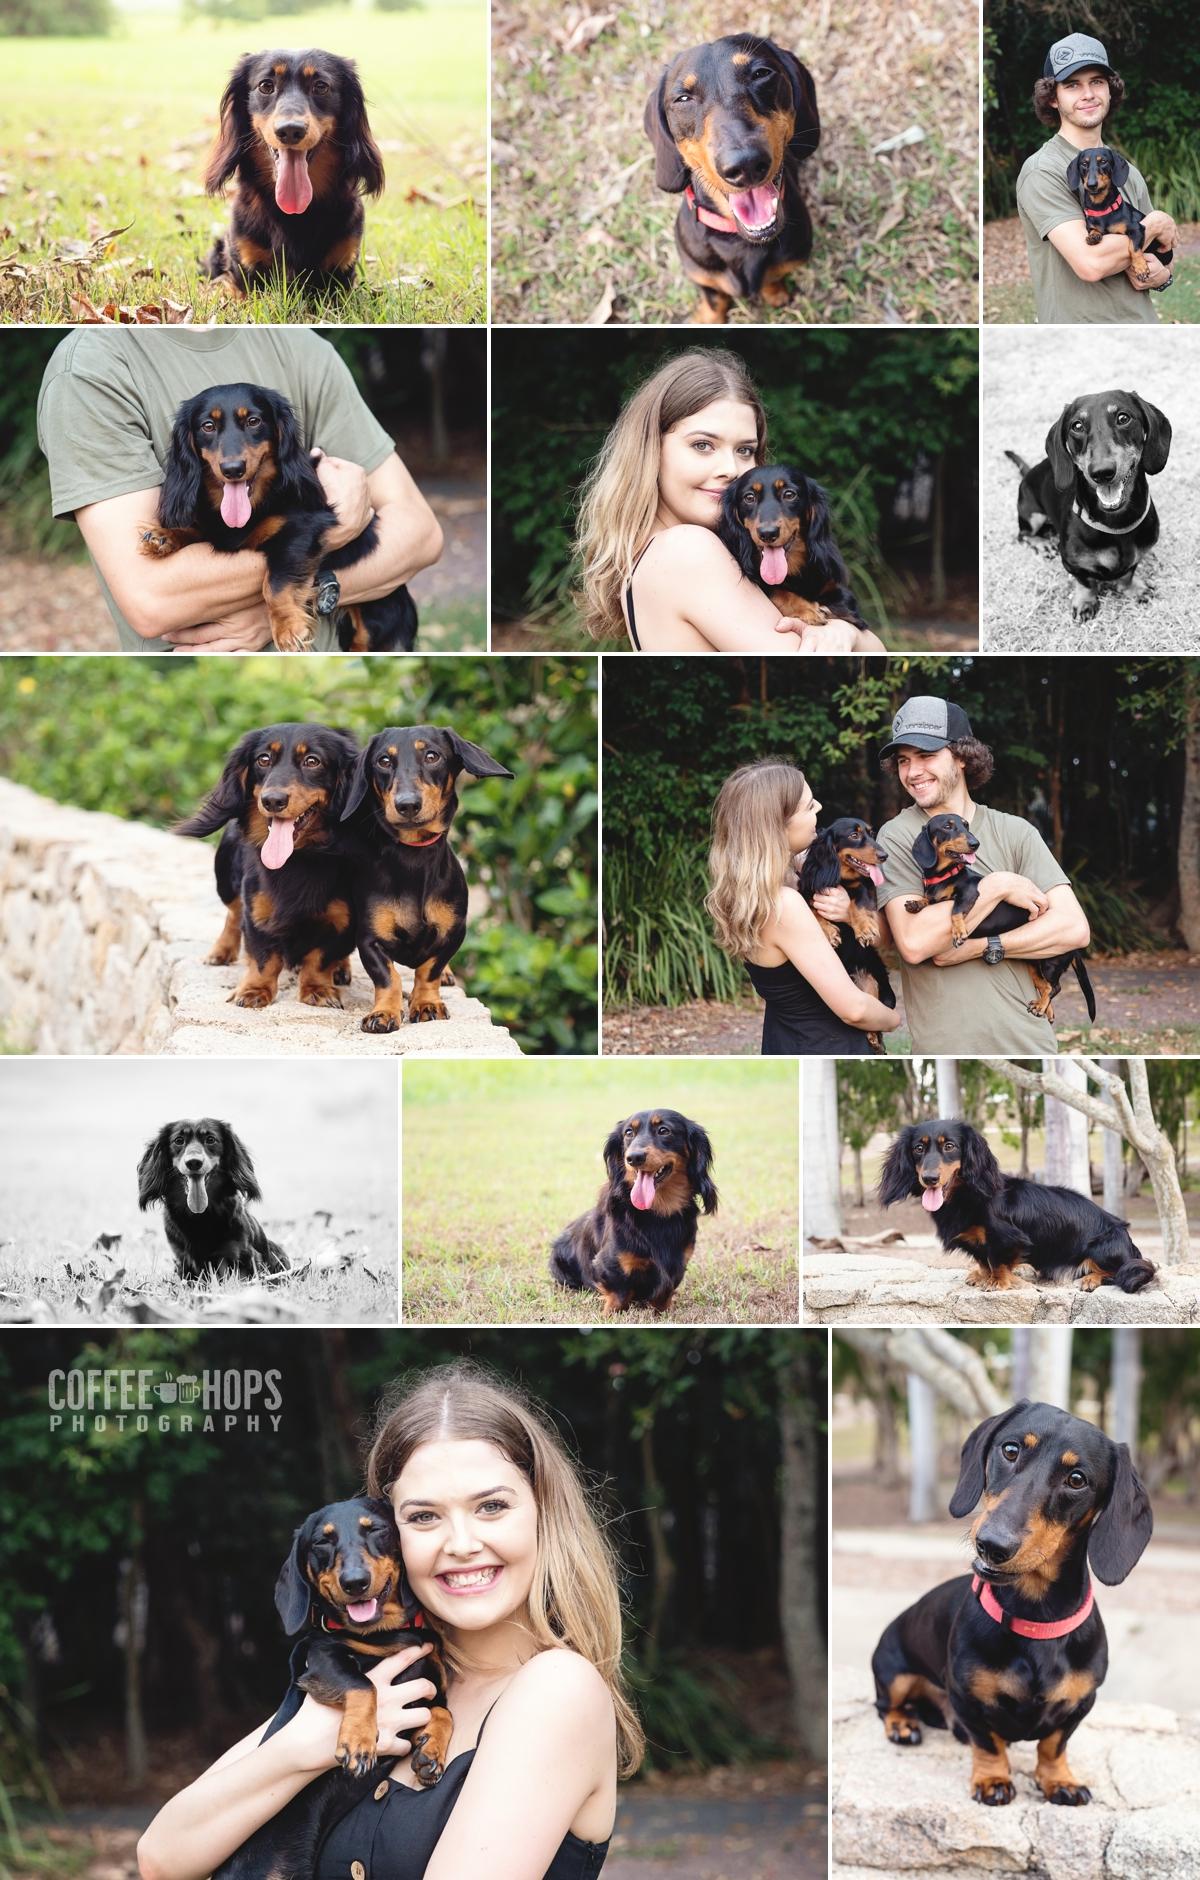 Pablo-Oatie-Dachshunds-pet-photography-session-at-mackay-botanic-gardens.jpg